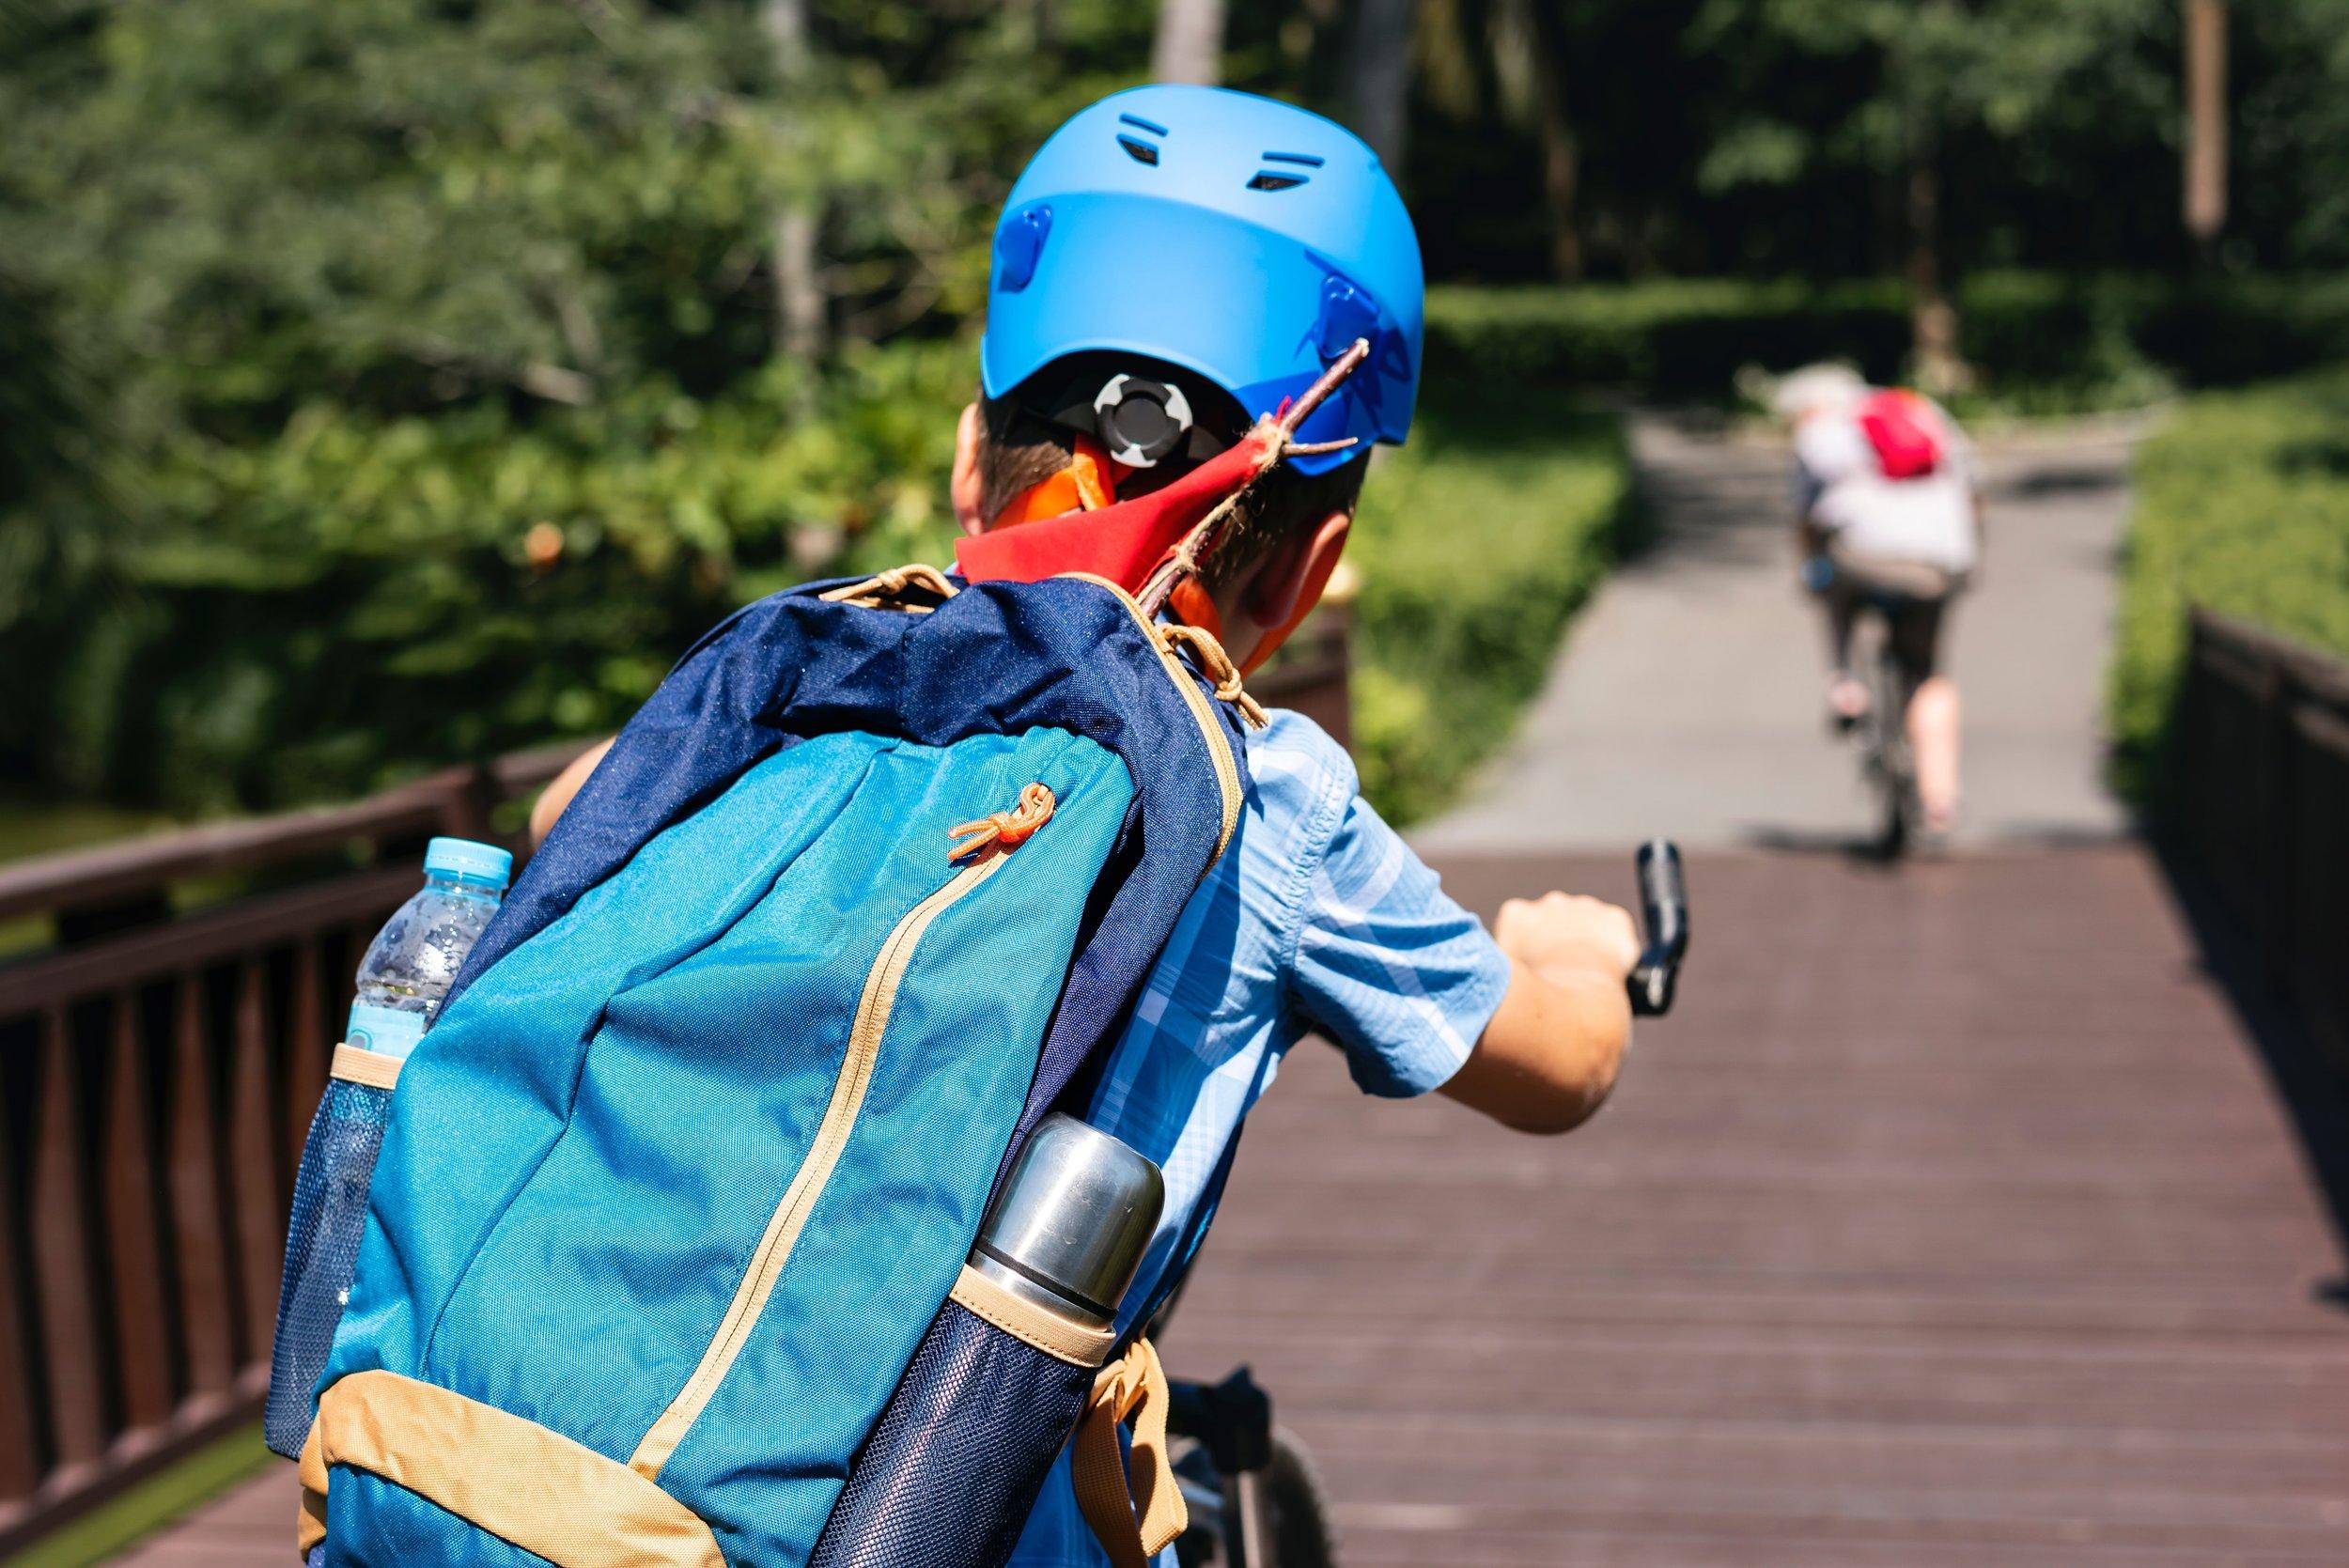 action-activity-adventure-1374543.jpg